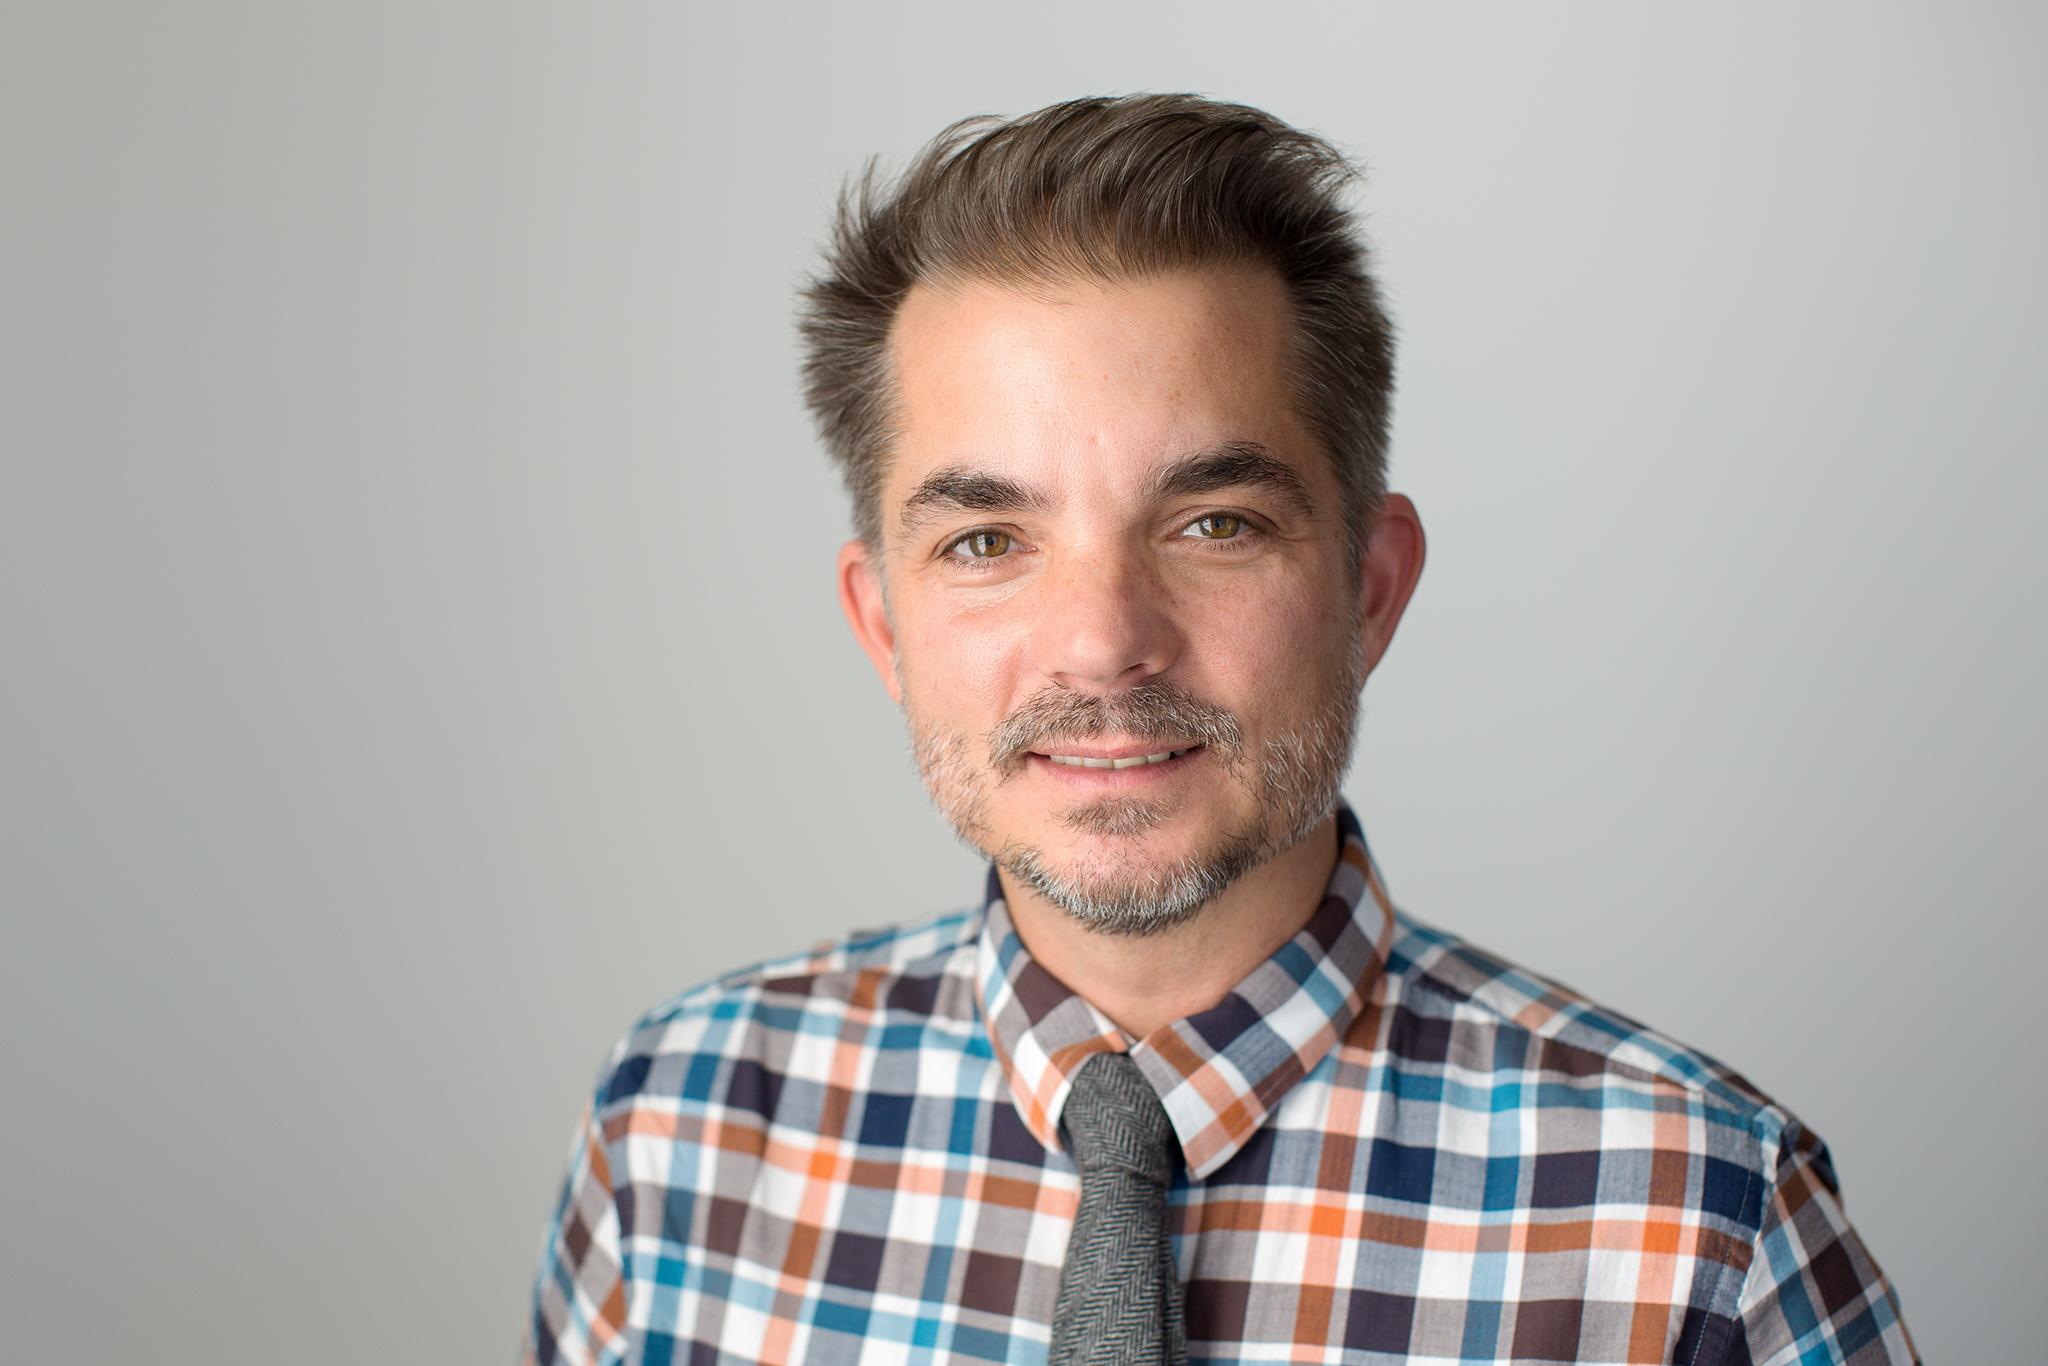 Gregg Rogers, MSN, APRN, PMHNP-BC, FNP-BC